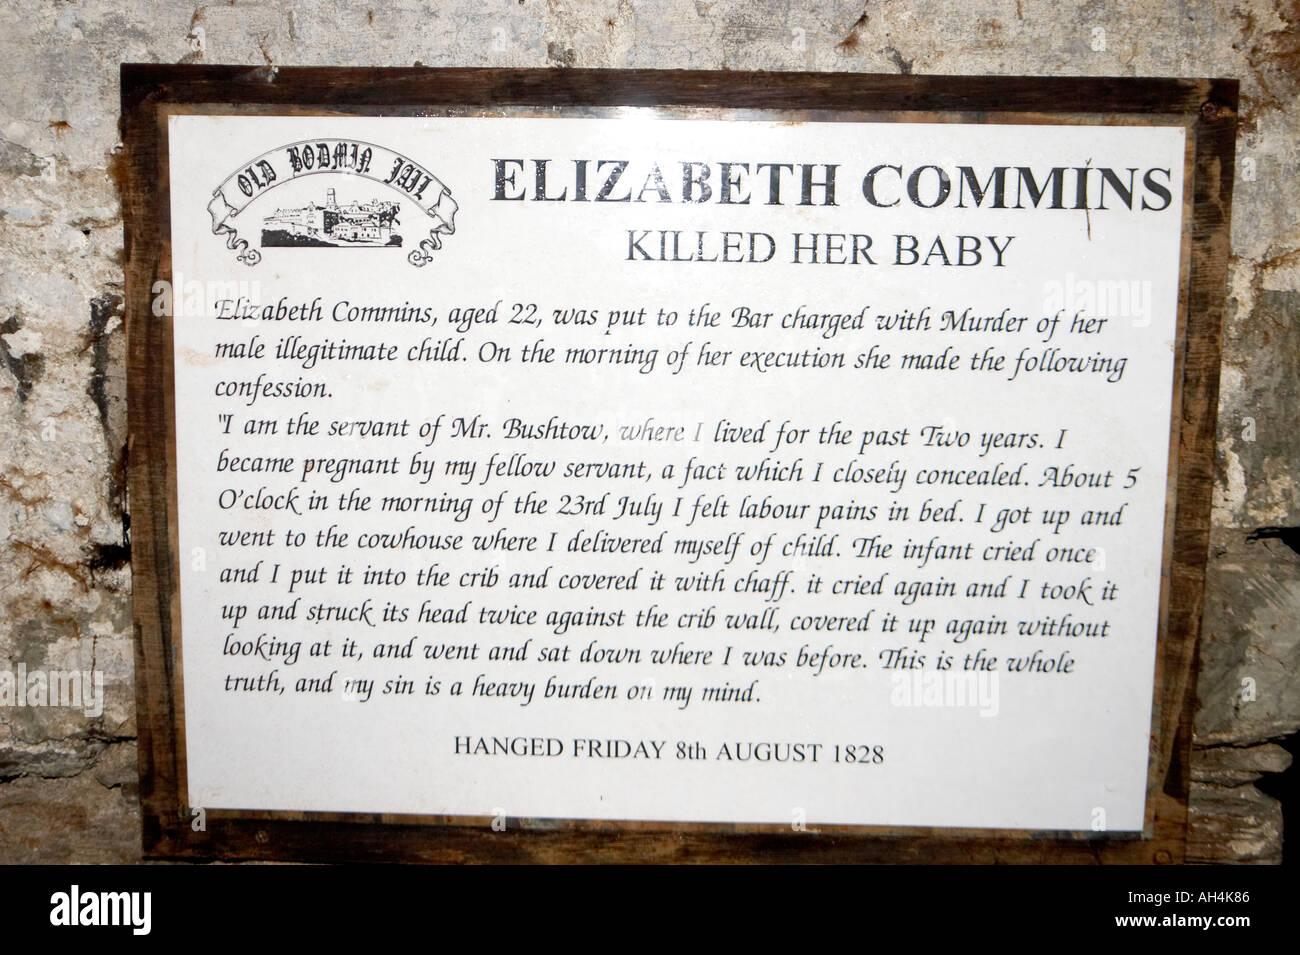 Display panel featuring Elizabeth Commins child murderer in